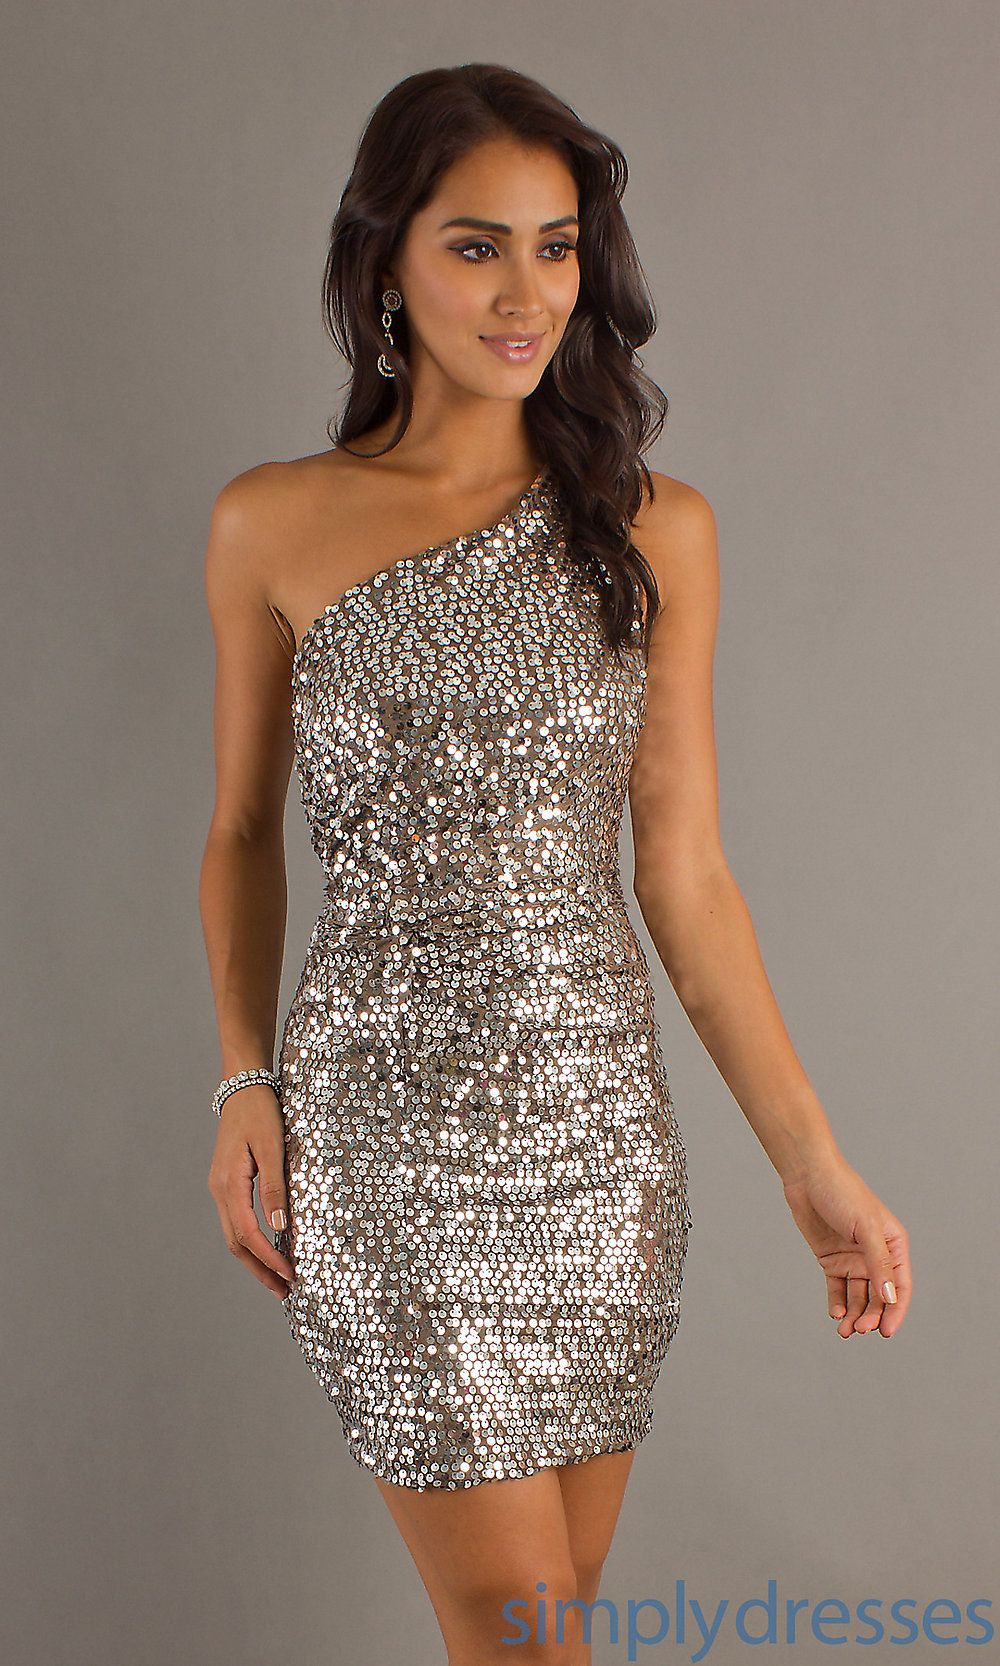 Short One Shoulder Dress, Sequin Cocktail Dress - Simply Dresses ...